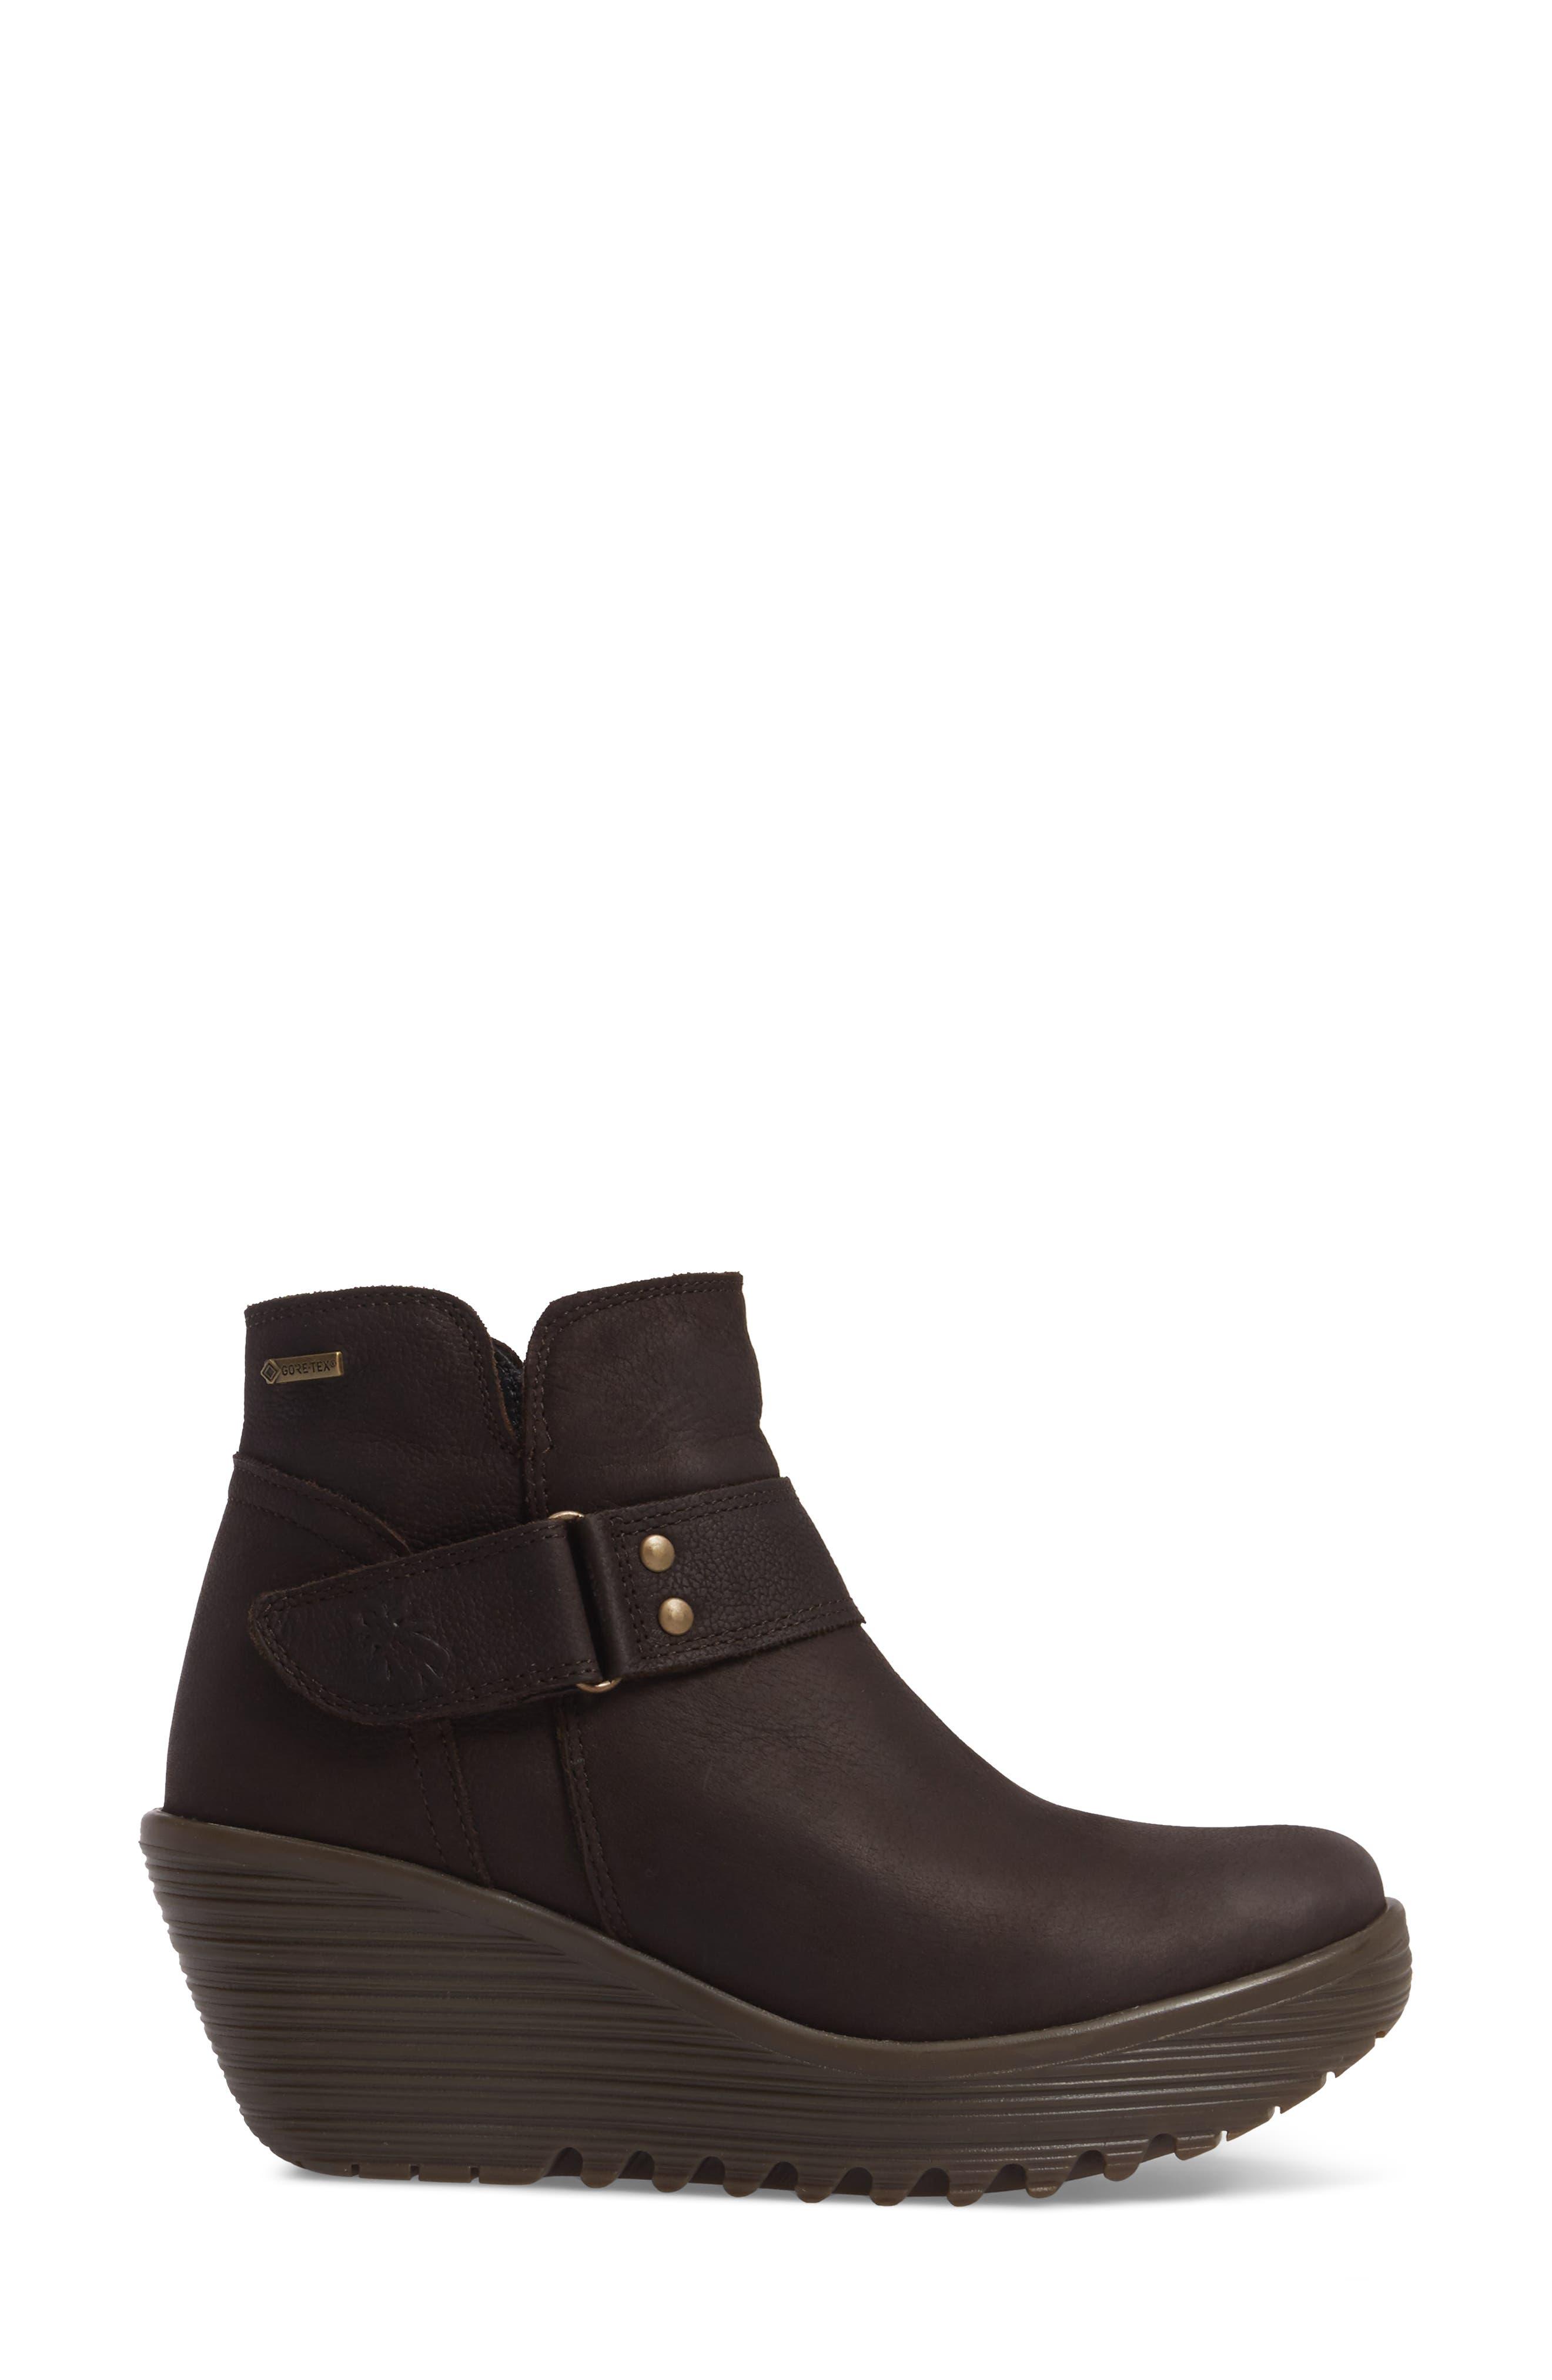 Alternate Image 3  - Fly London Yock Waterproof Gore-Tex® Wedge Boot (Women)